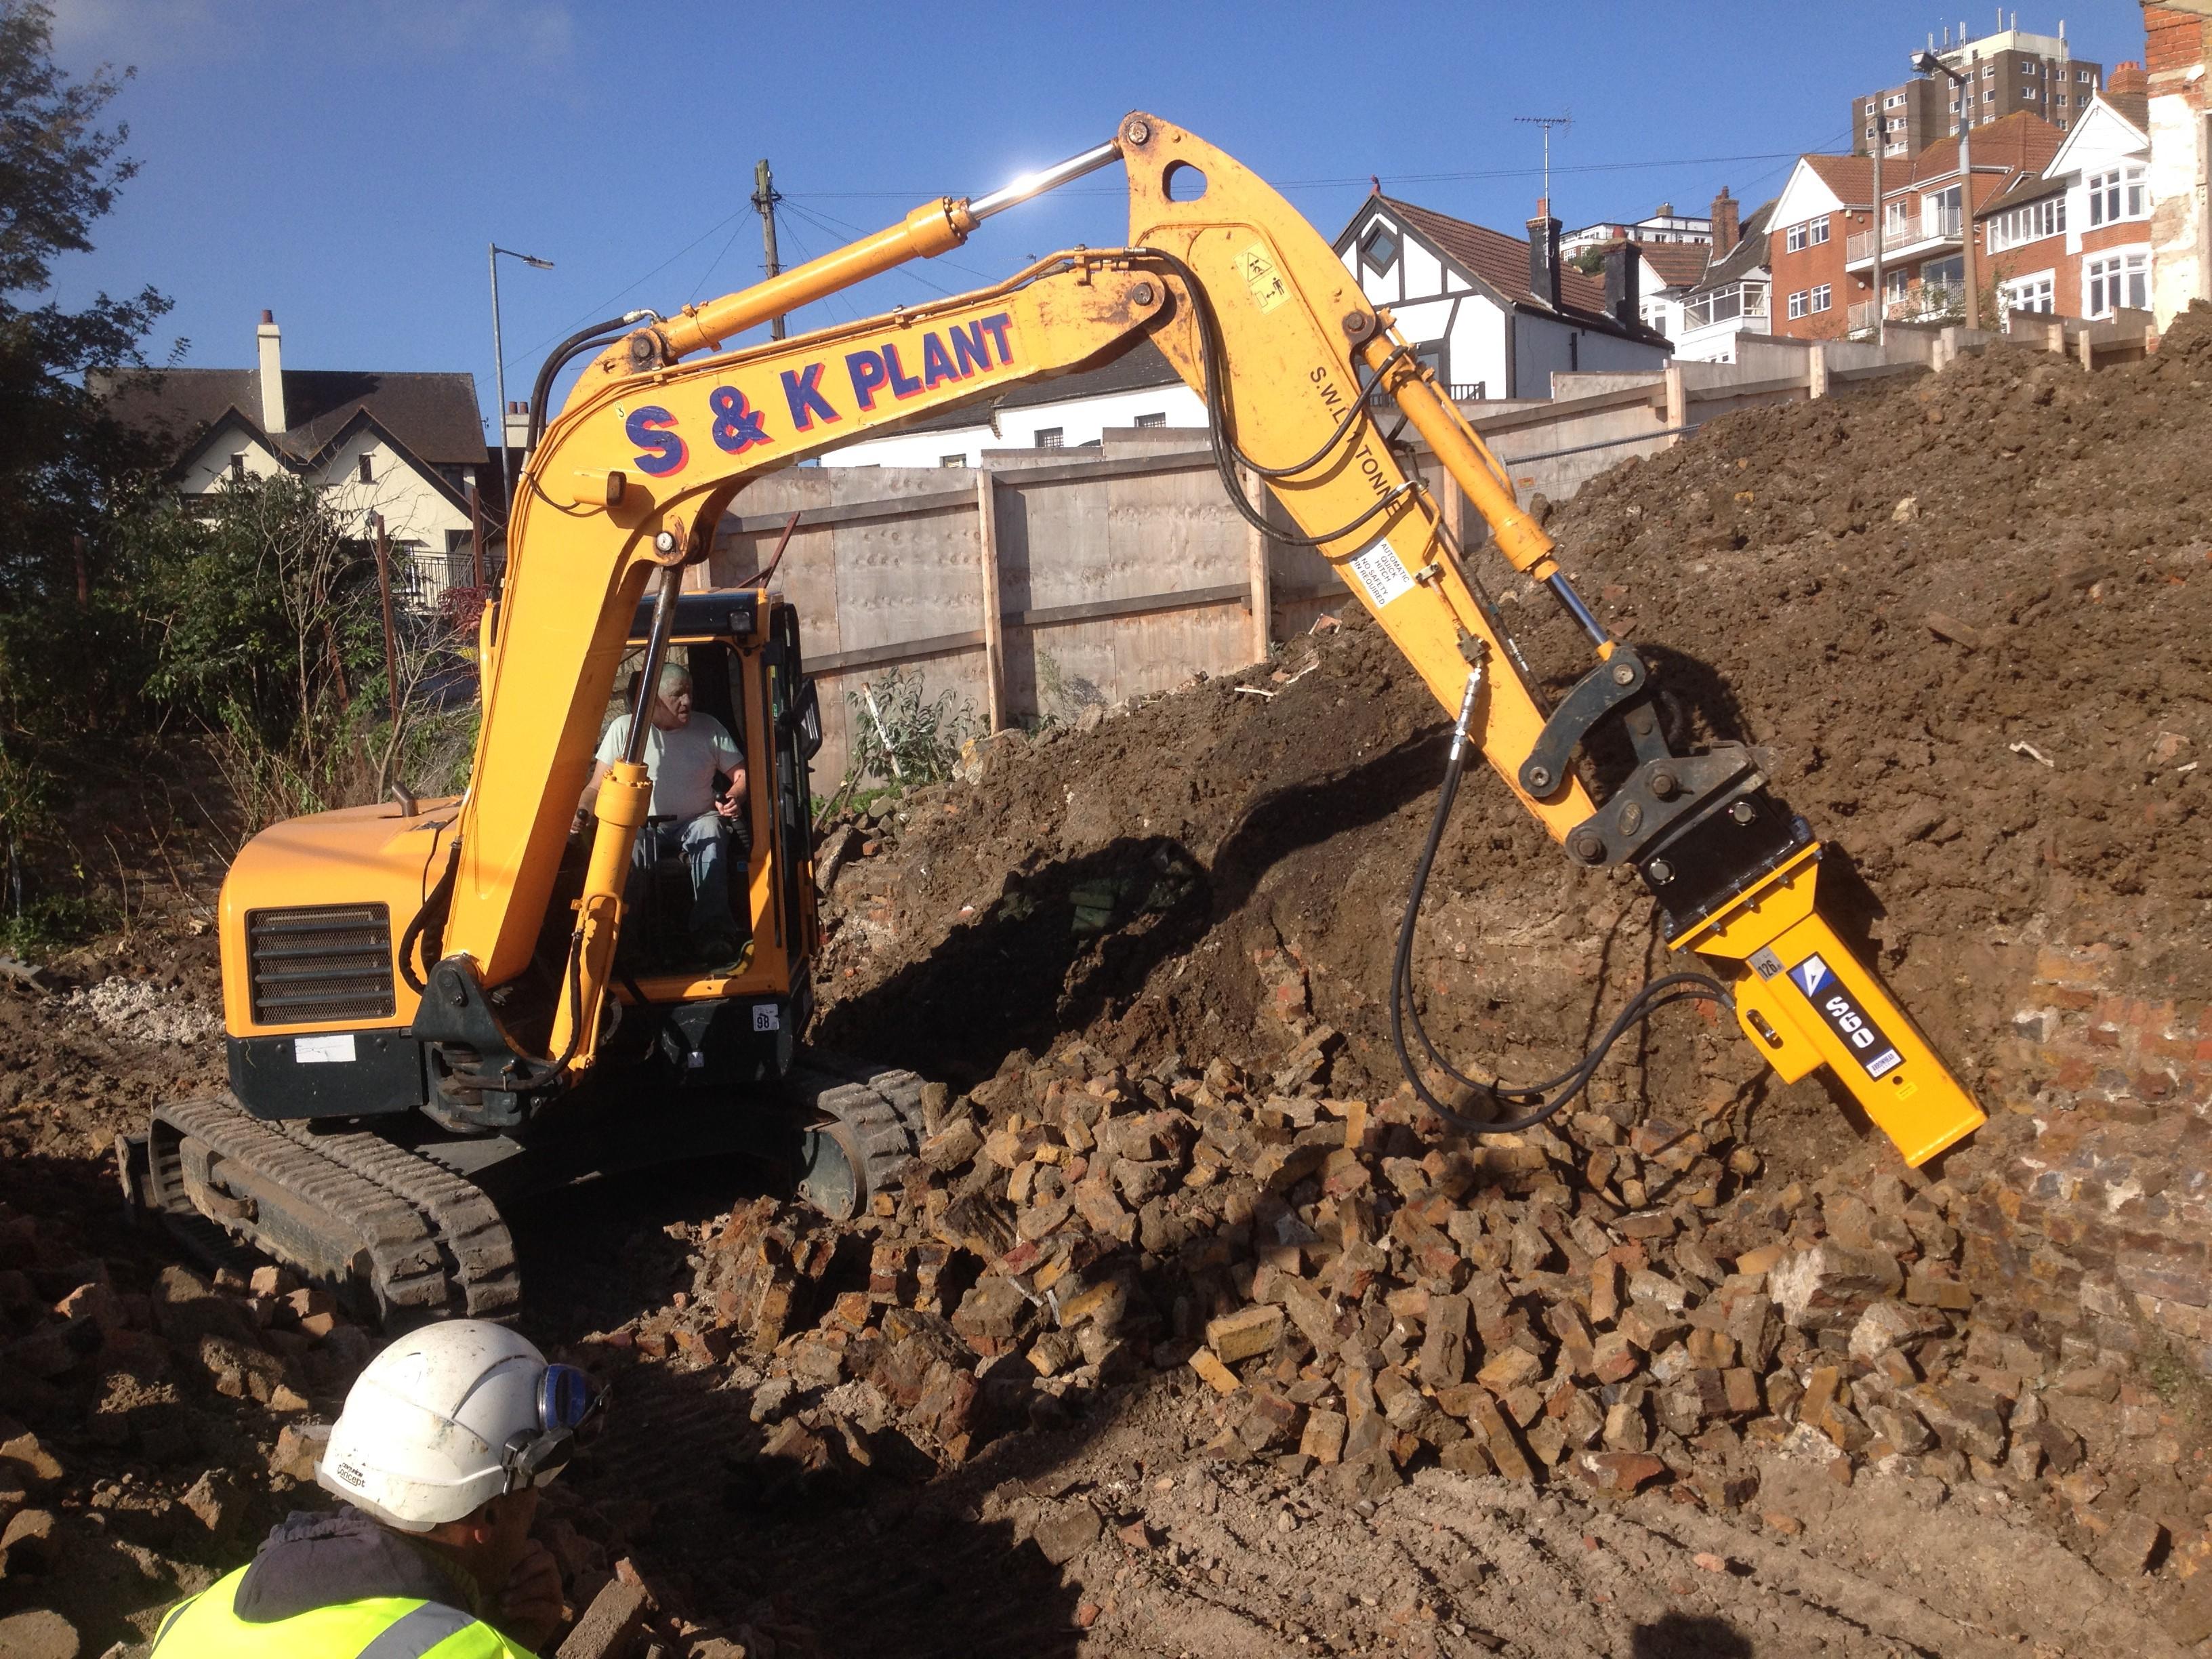 Leigh-On-Sea (Huttons Construction) 2014/2015